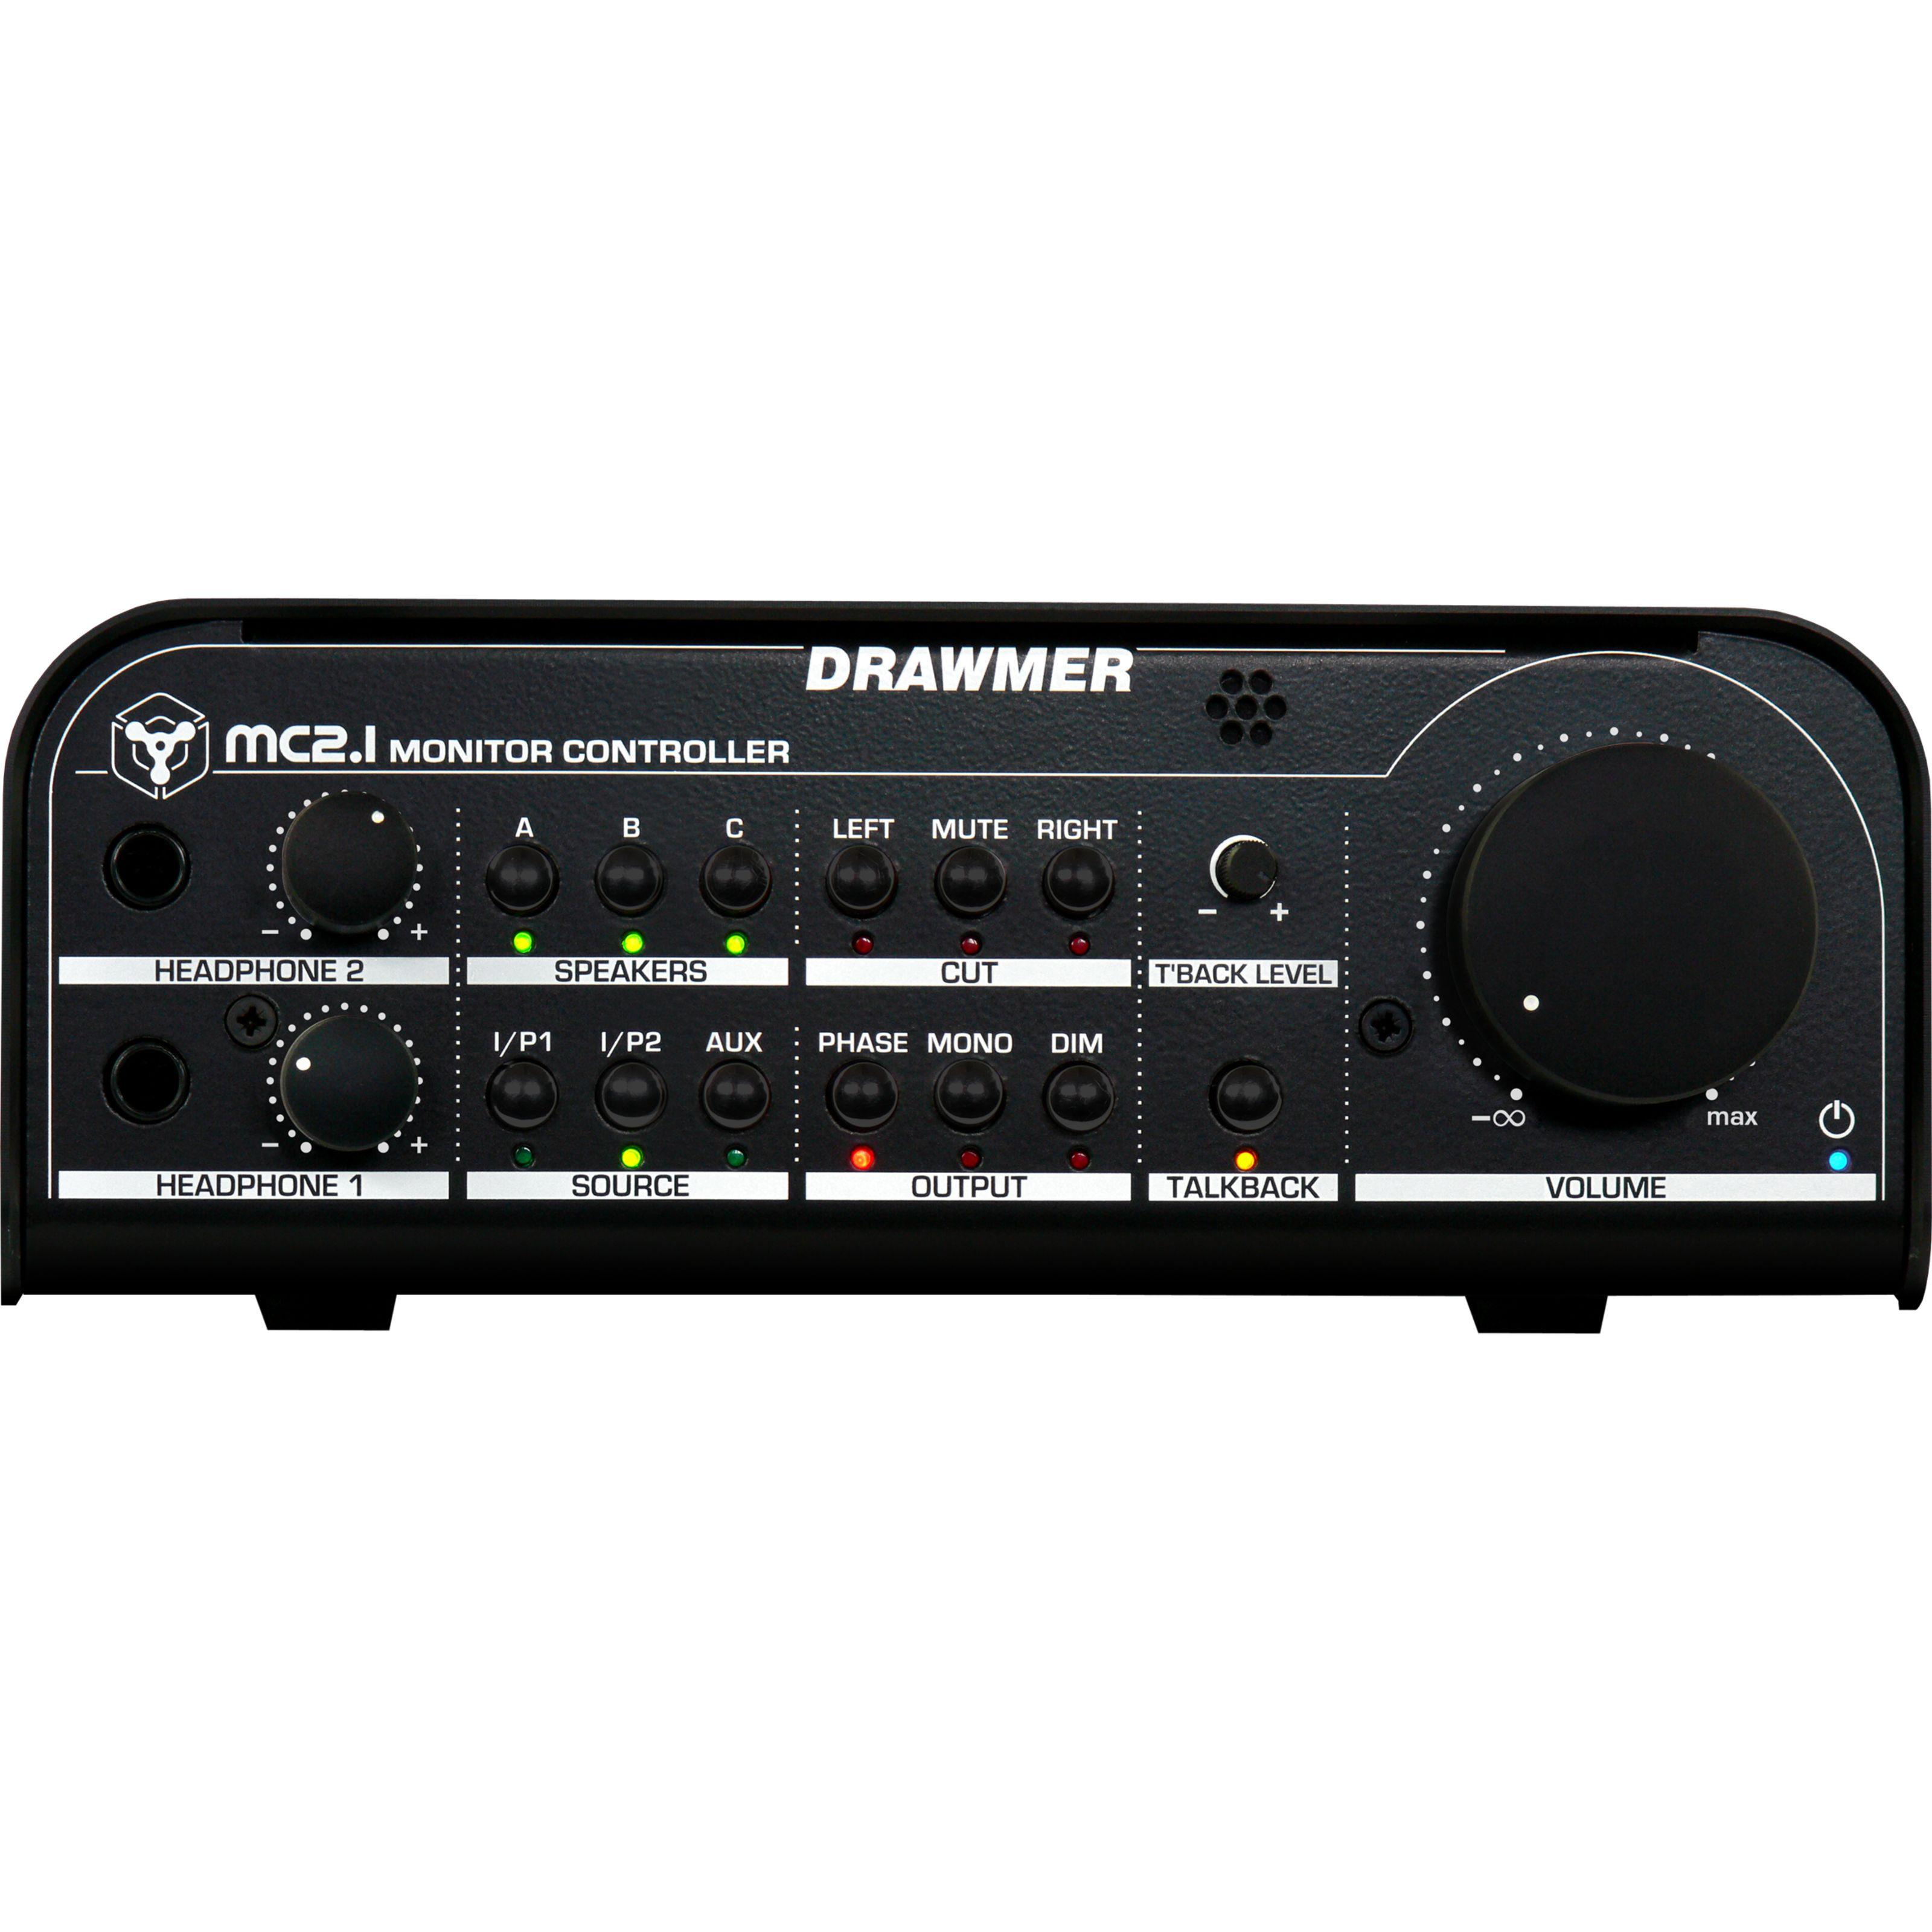 Drawmer - MC2.1 Monitorcontroller